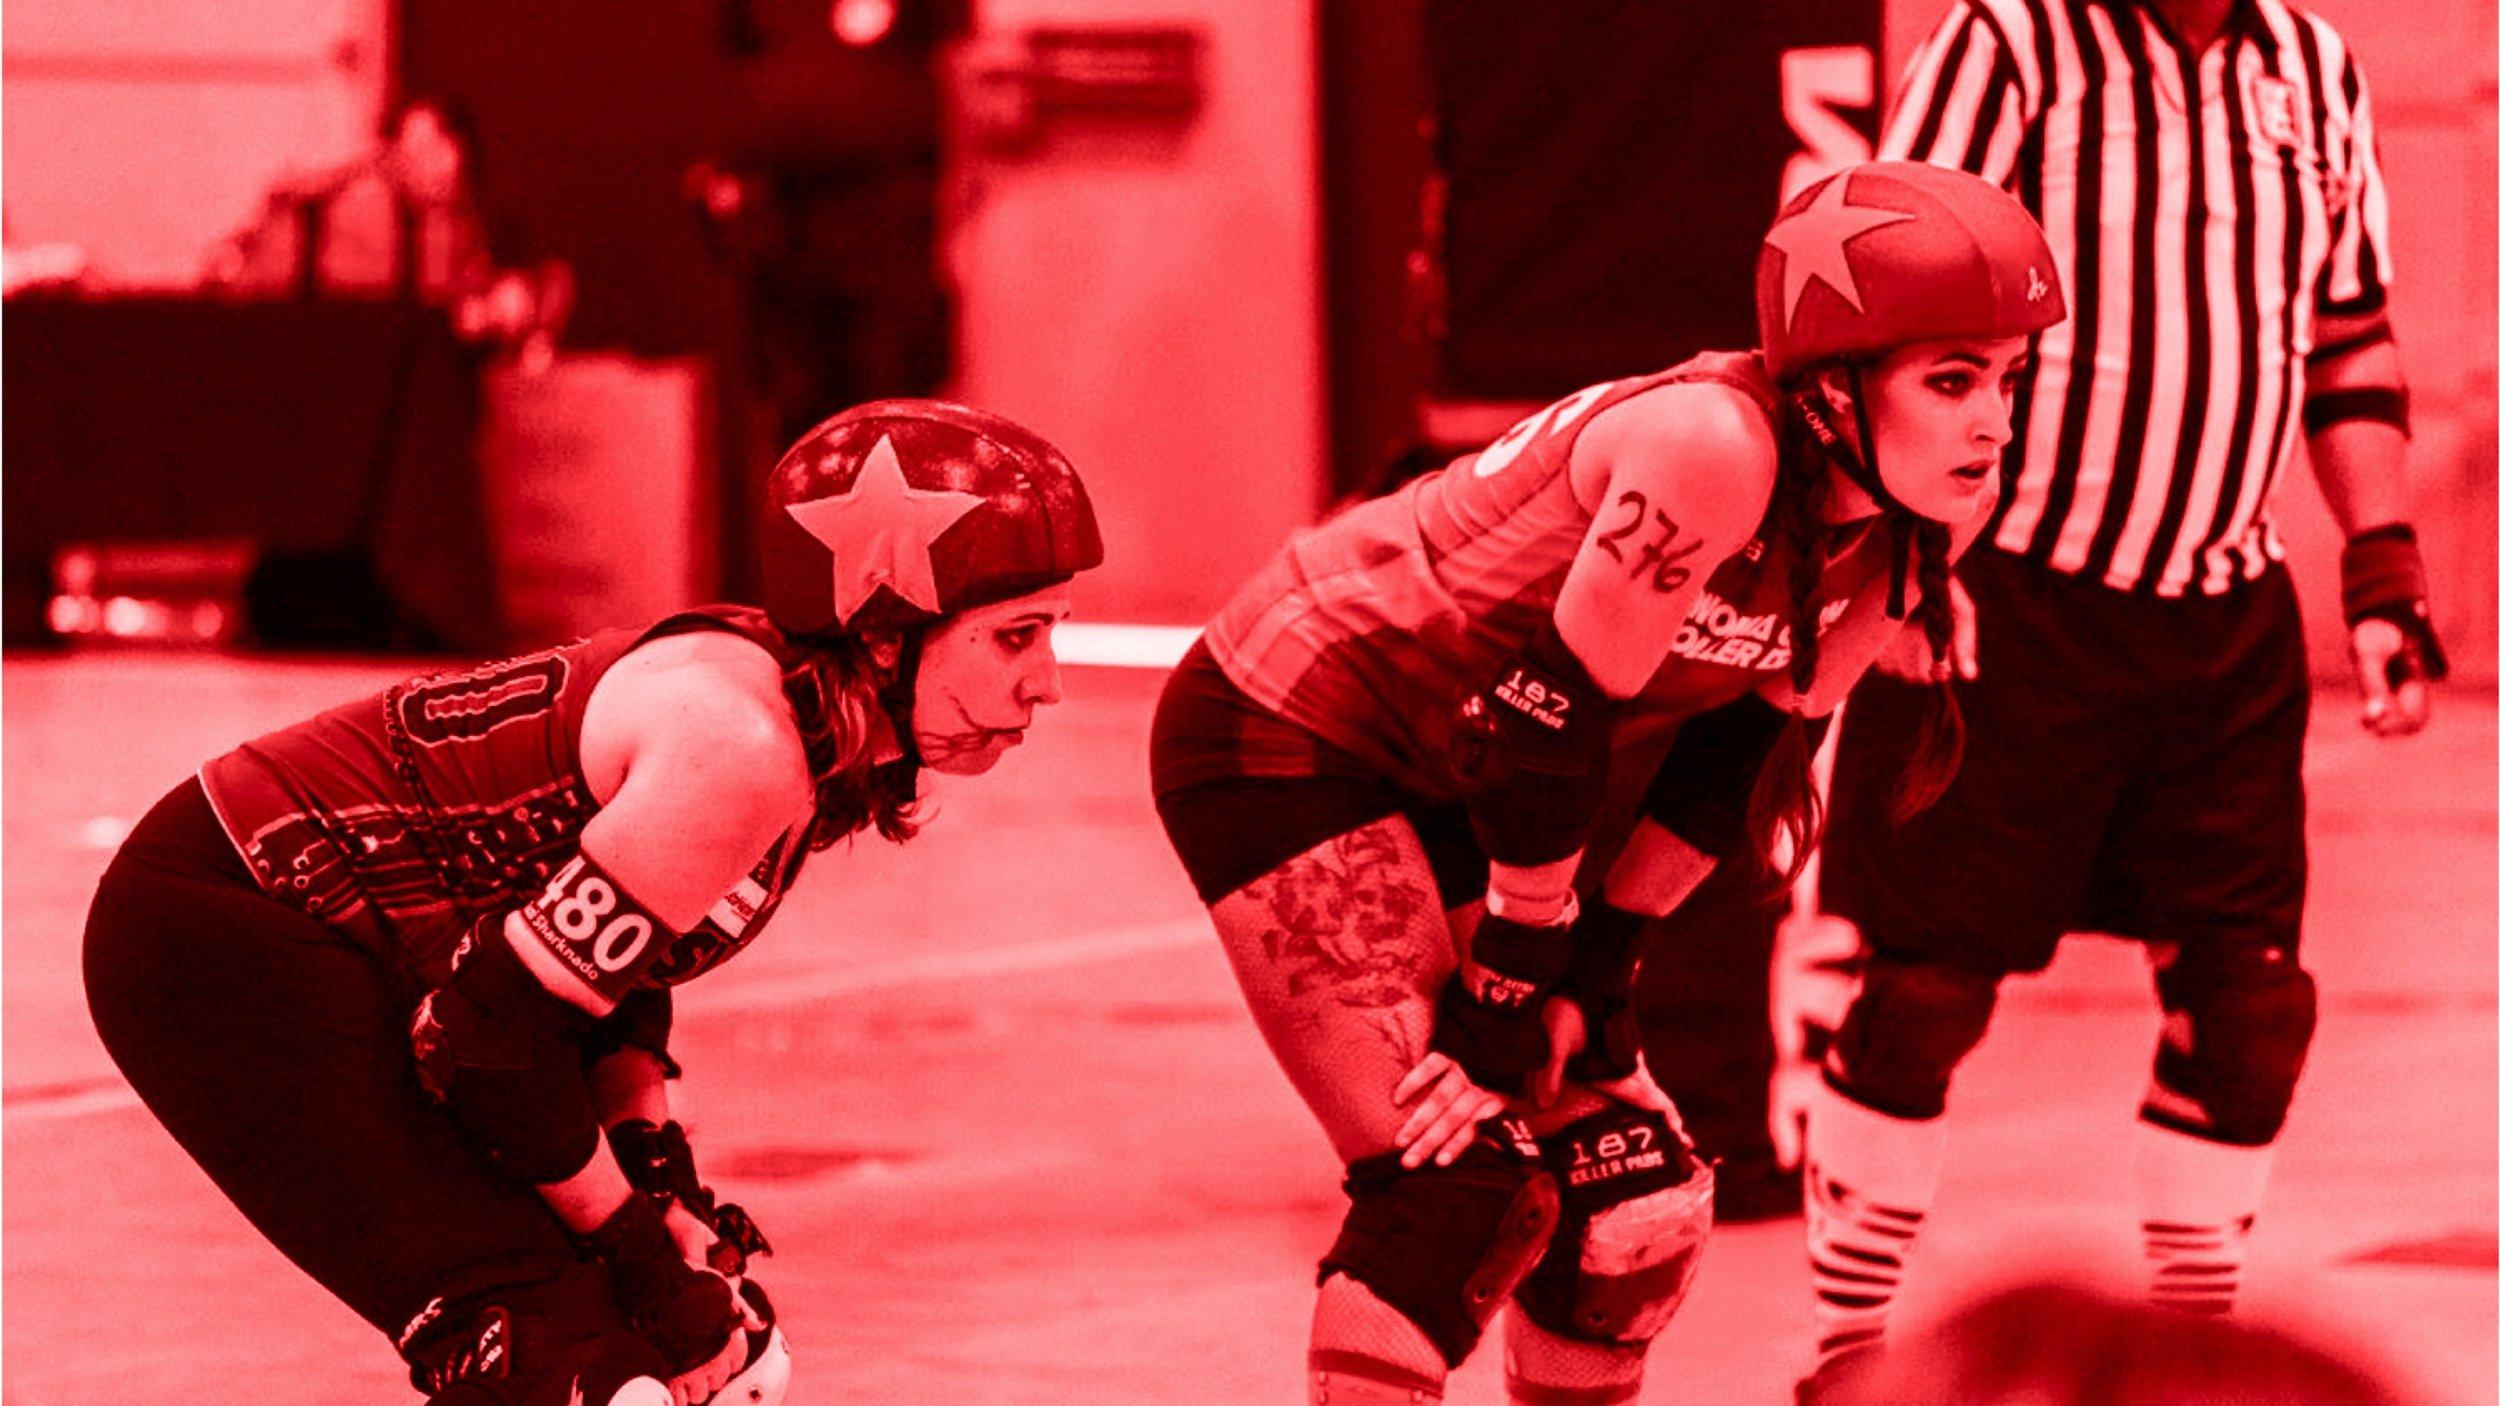 171118-Skate Mate -Jill Daisy -FINAL_Page_15.jpg